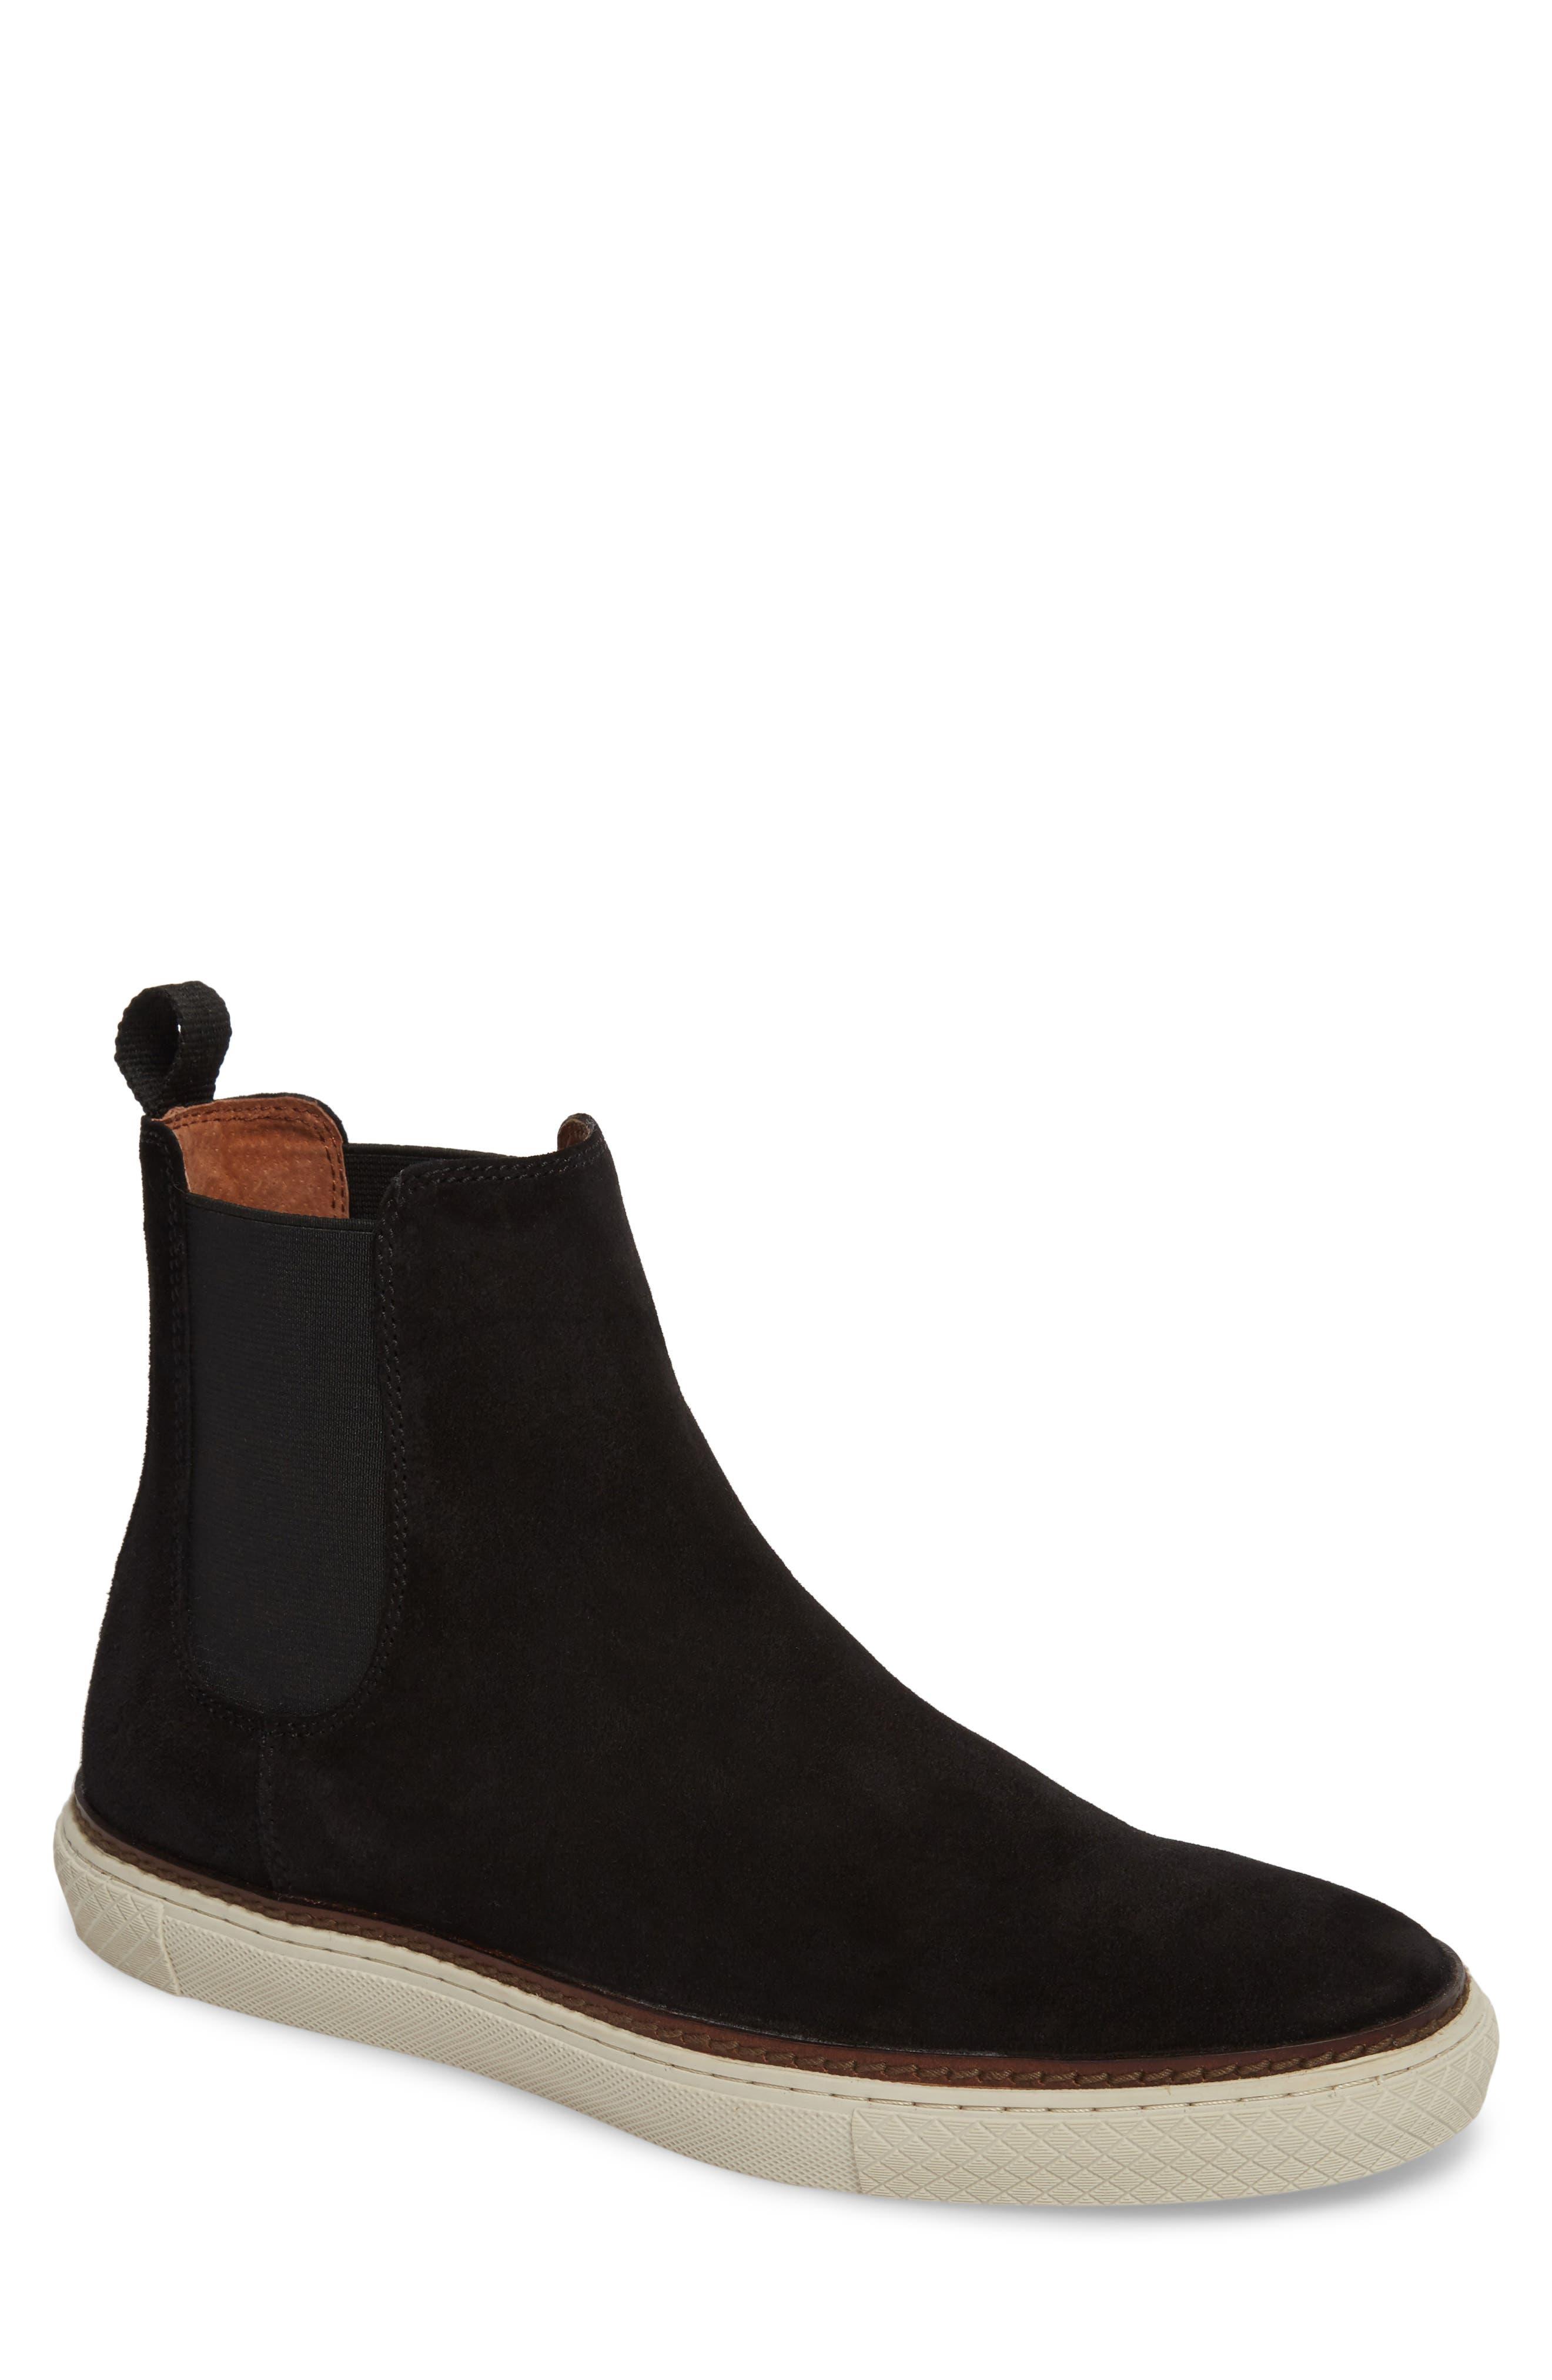 Gates Chelsea Boot,                         Main,                         color,